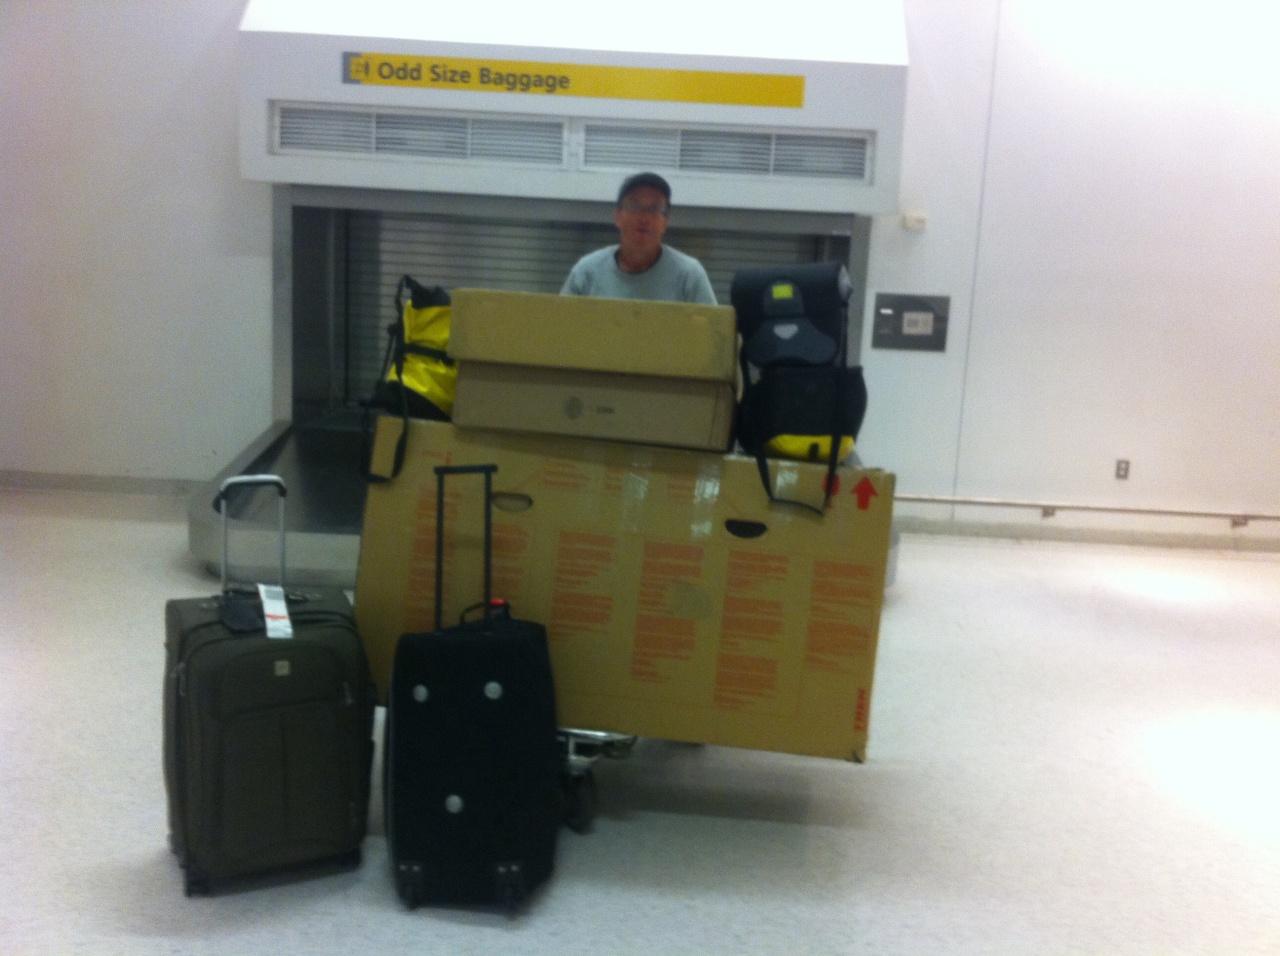 San Francisco to New York: Bikes, Bags, Luggage andLogistics